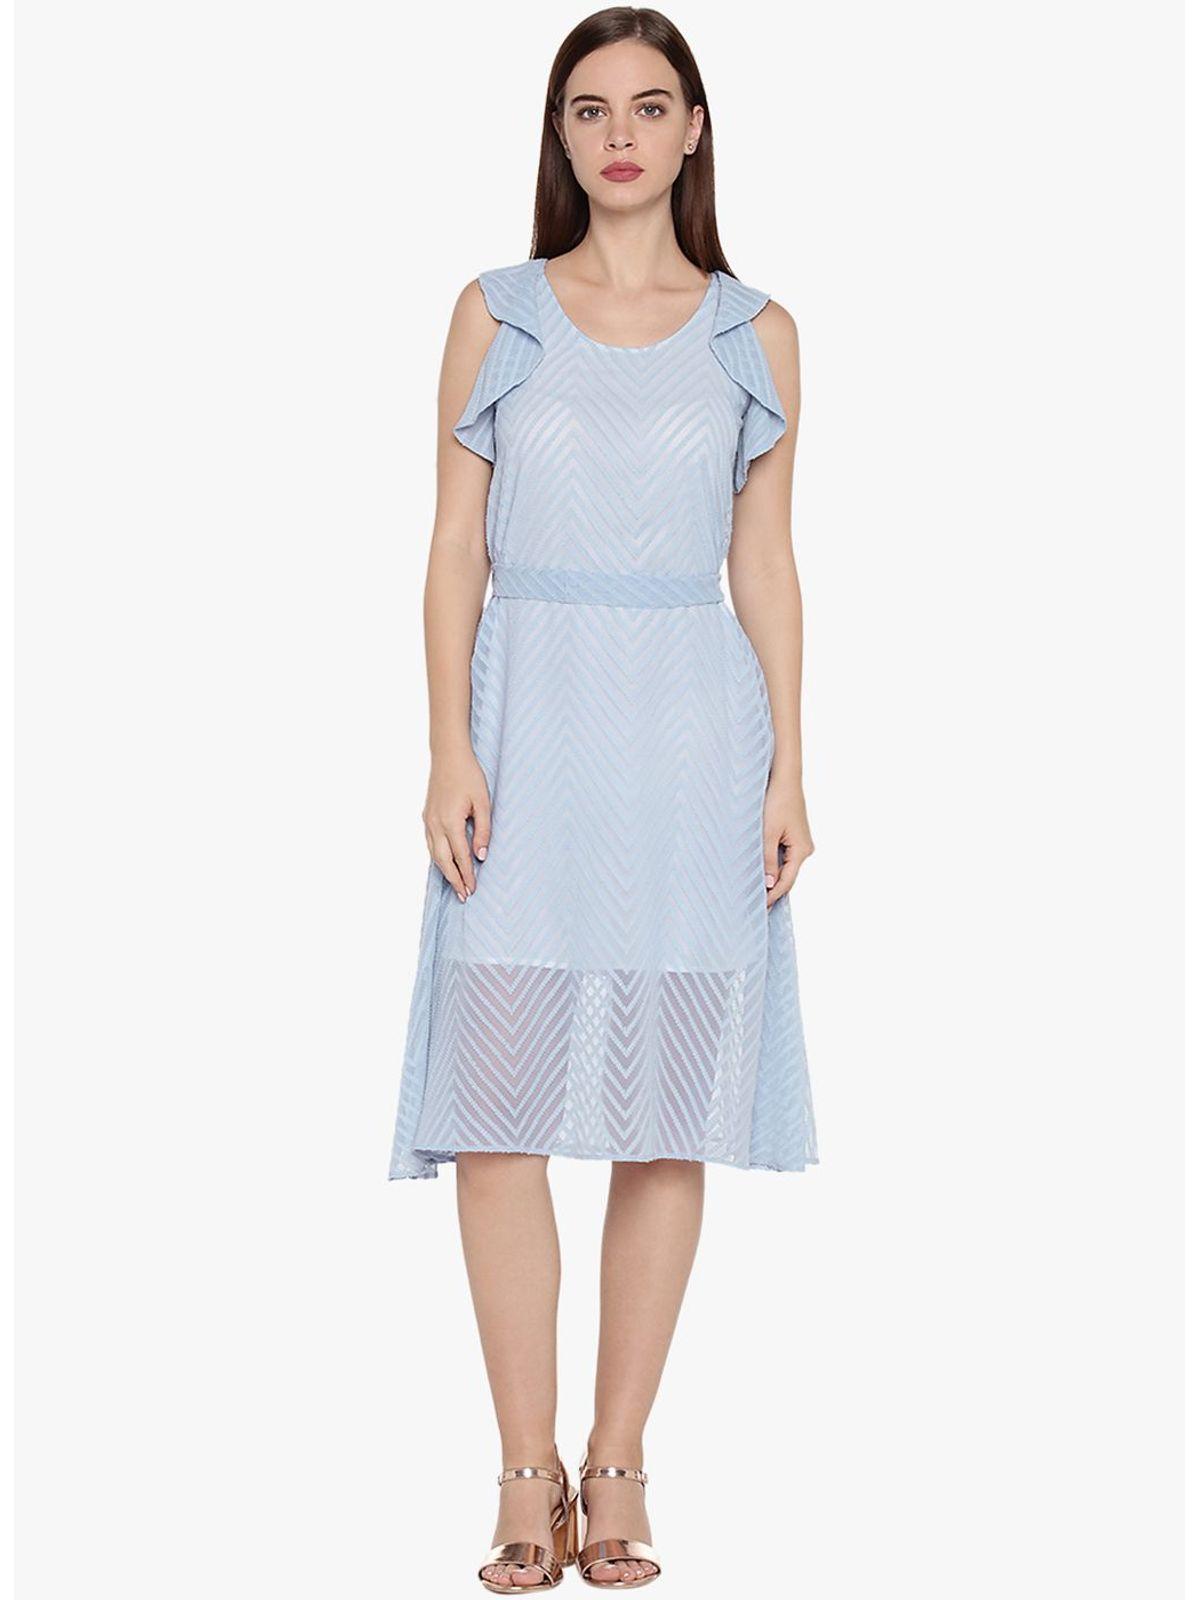 HELENA RUFFLE DRESS